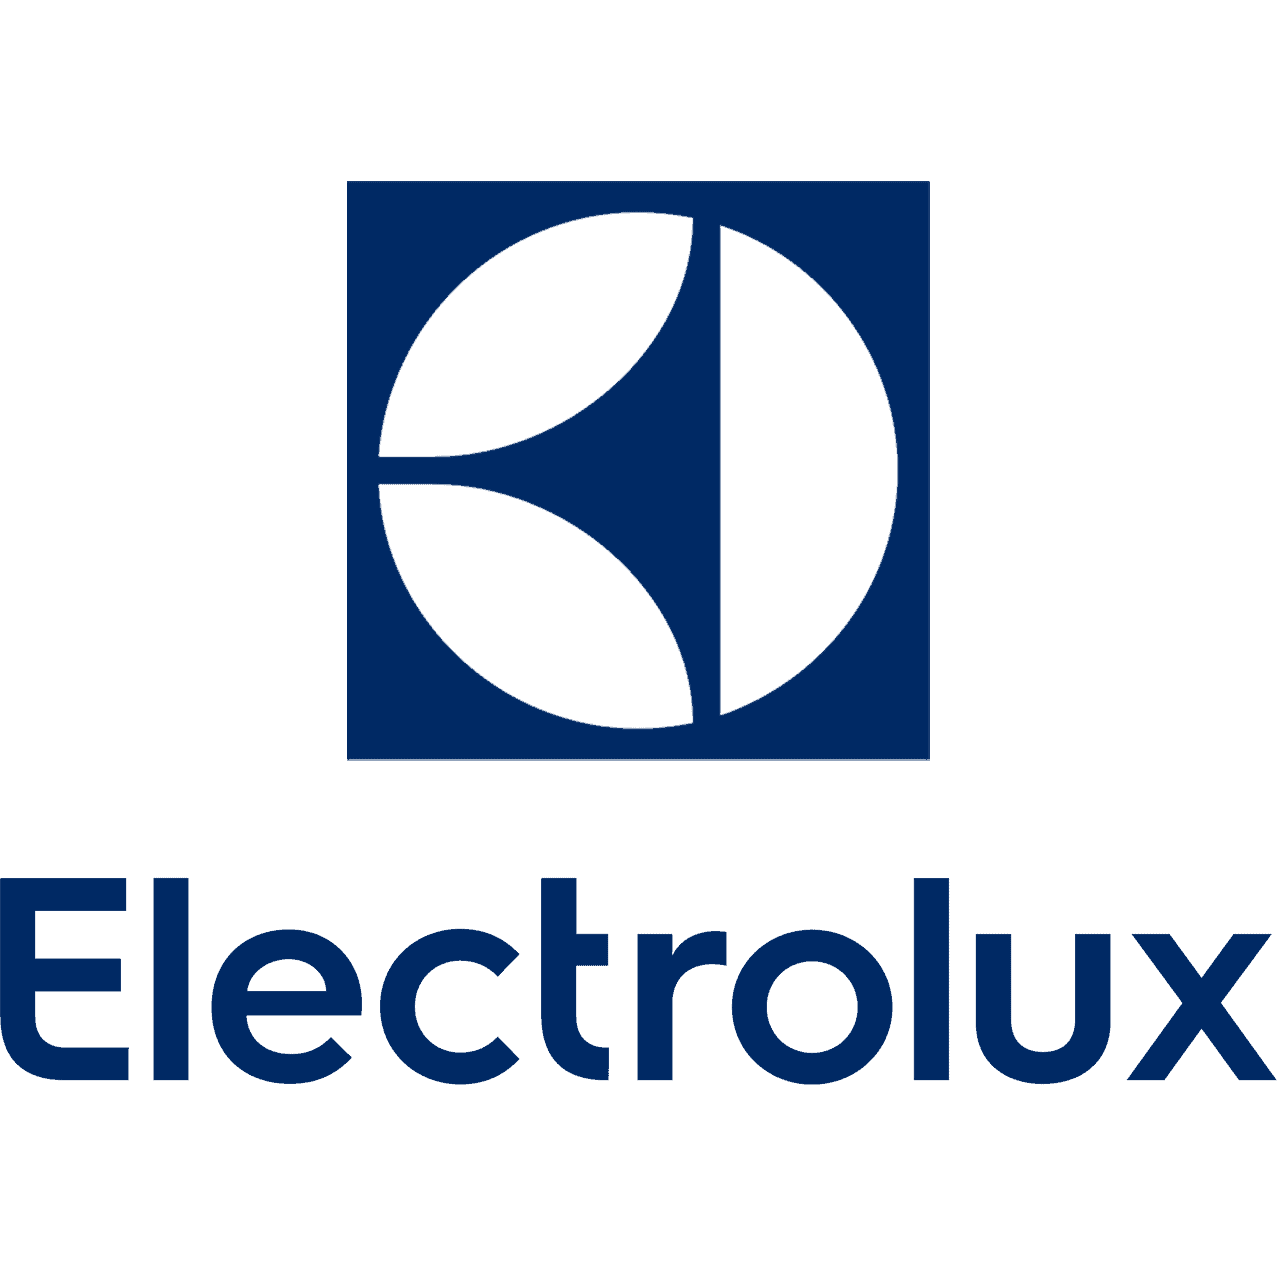 Electrolux-Android-ios-mobile-application-erp-development-software-house-egypt-best-company-riyadh-jeddah-qatar-Bahrain-kuwait-Dubai-UAE-KSA-IOT